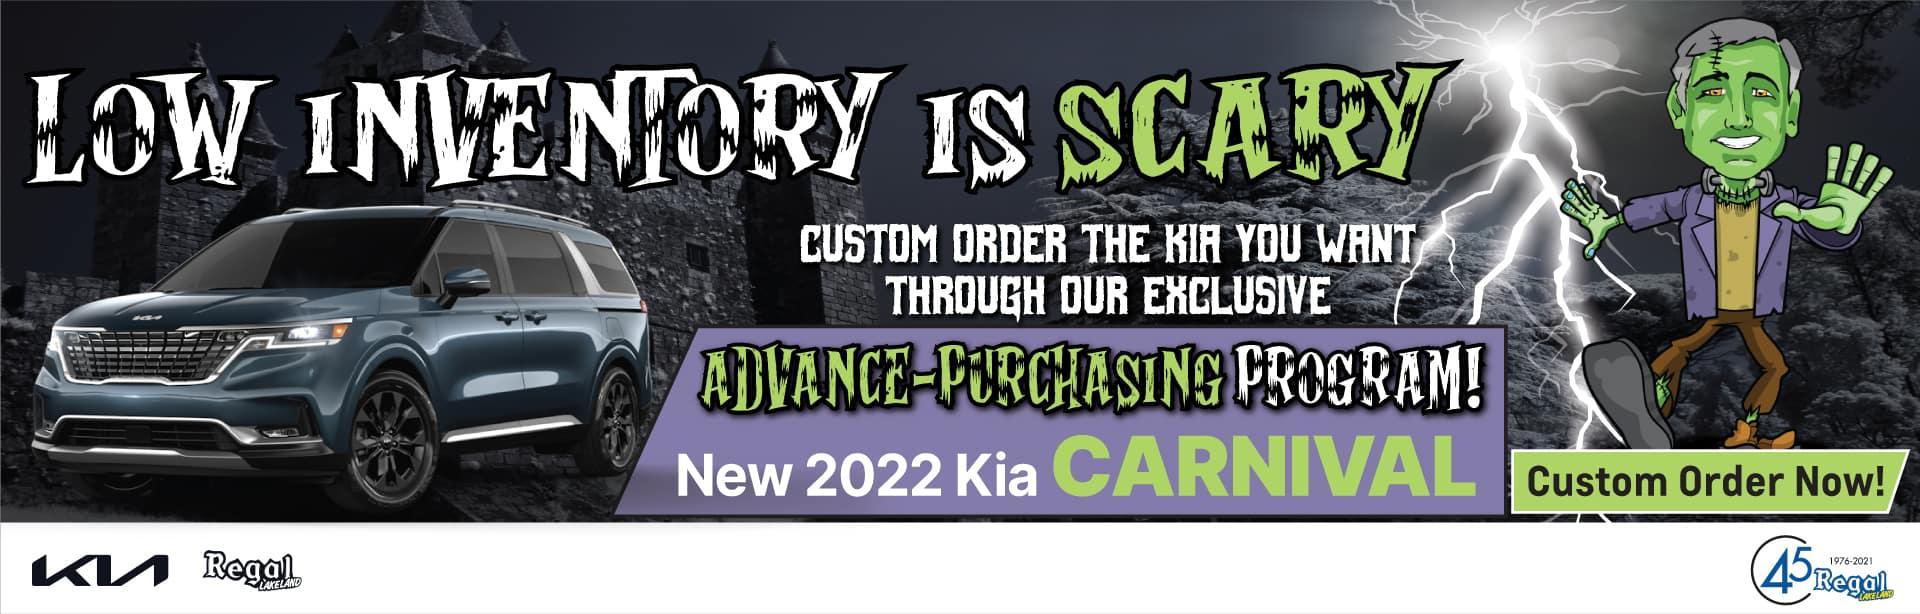 RAKP70758-1-KB_Scary_Carnival_desktop_oct21